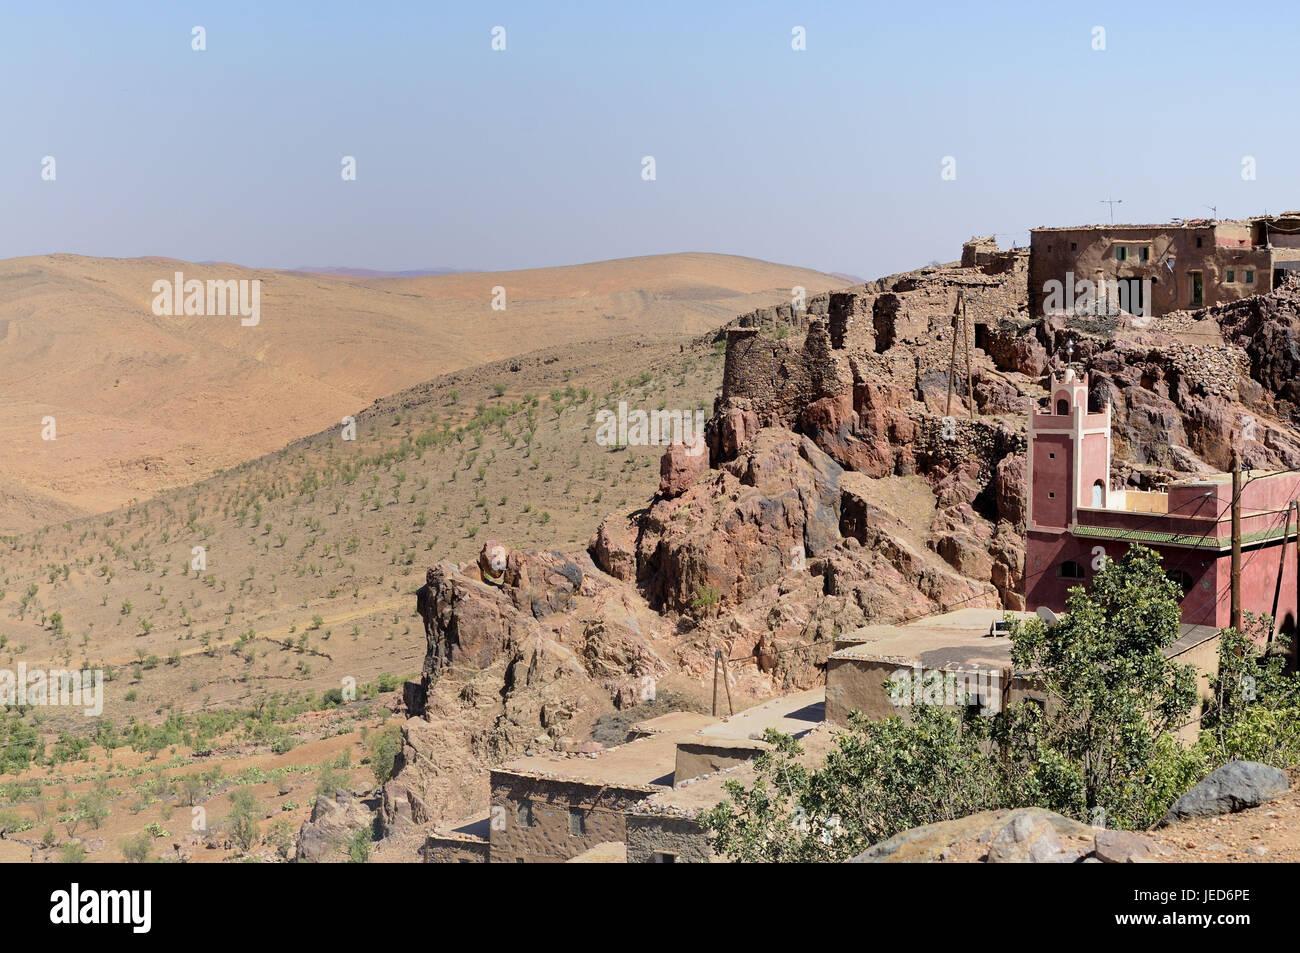 Bergdorf, Häuser, Moschee, Rock, Gaumenspalte, Anti-Atlas-Berge, Marokko, Afrika, Stockbild